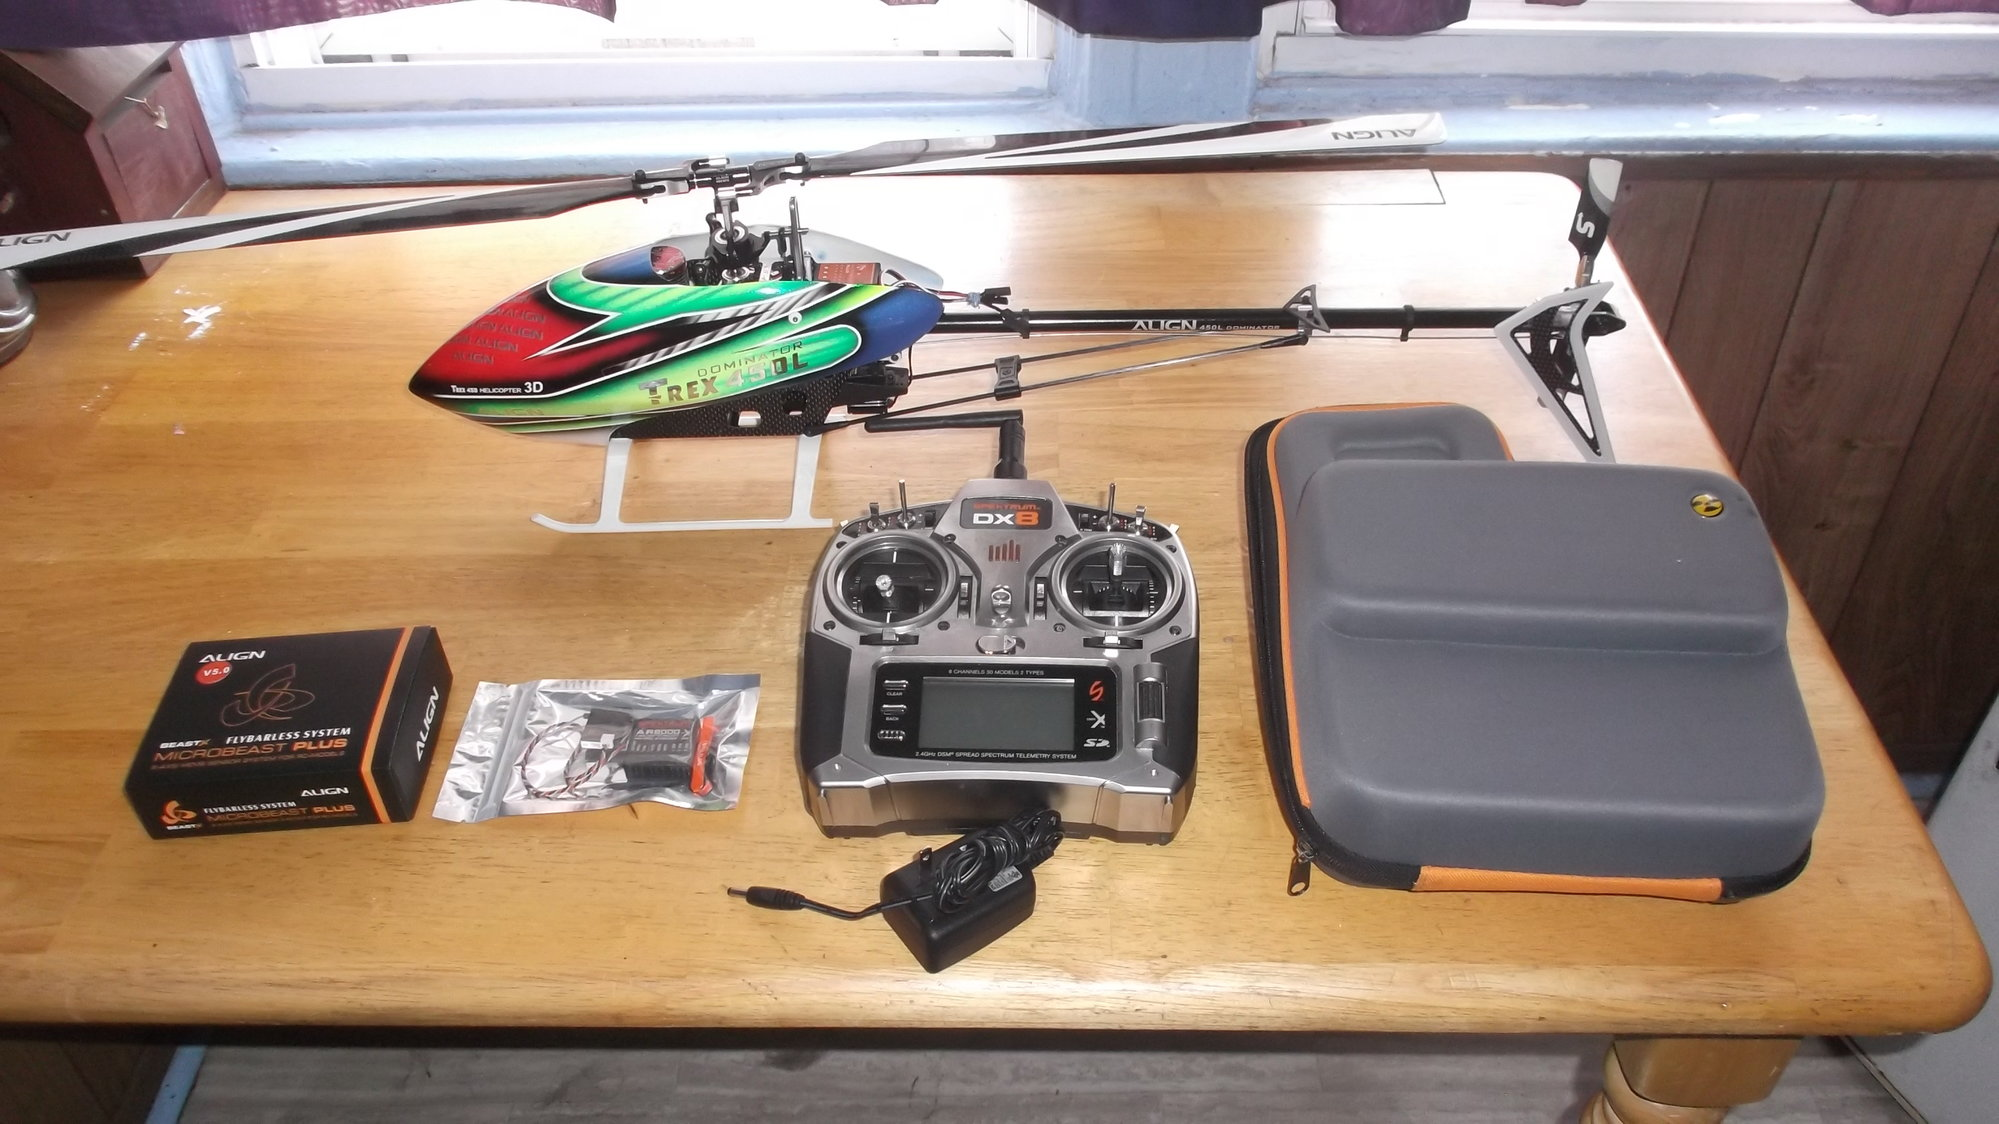 Brand new rtf align t-rex 450l dominator rc helicopter